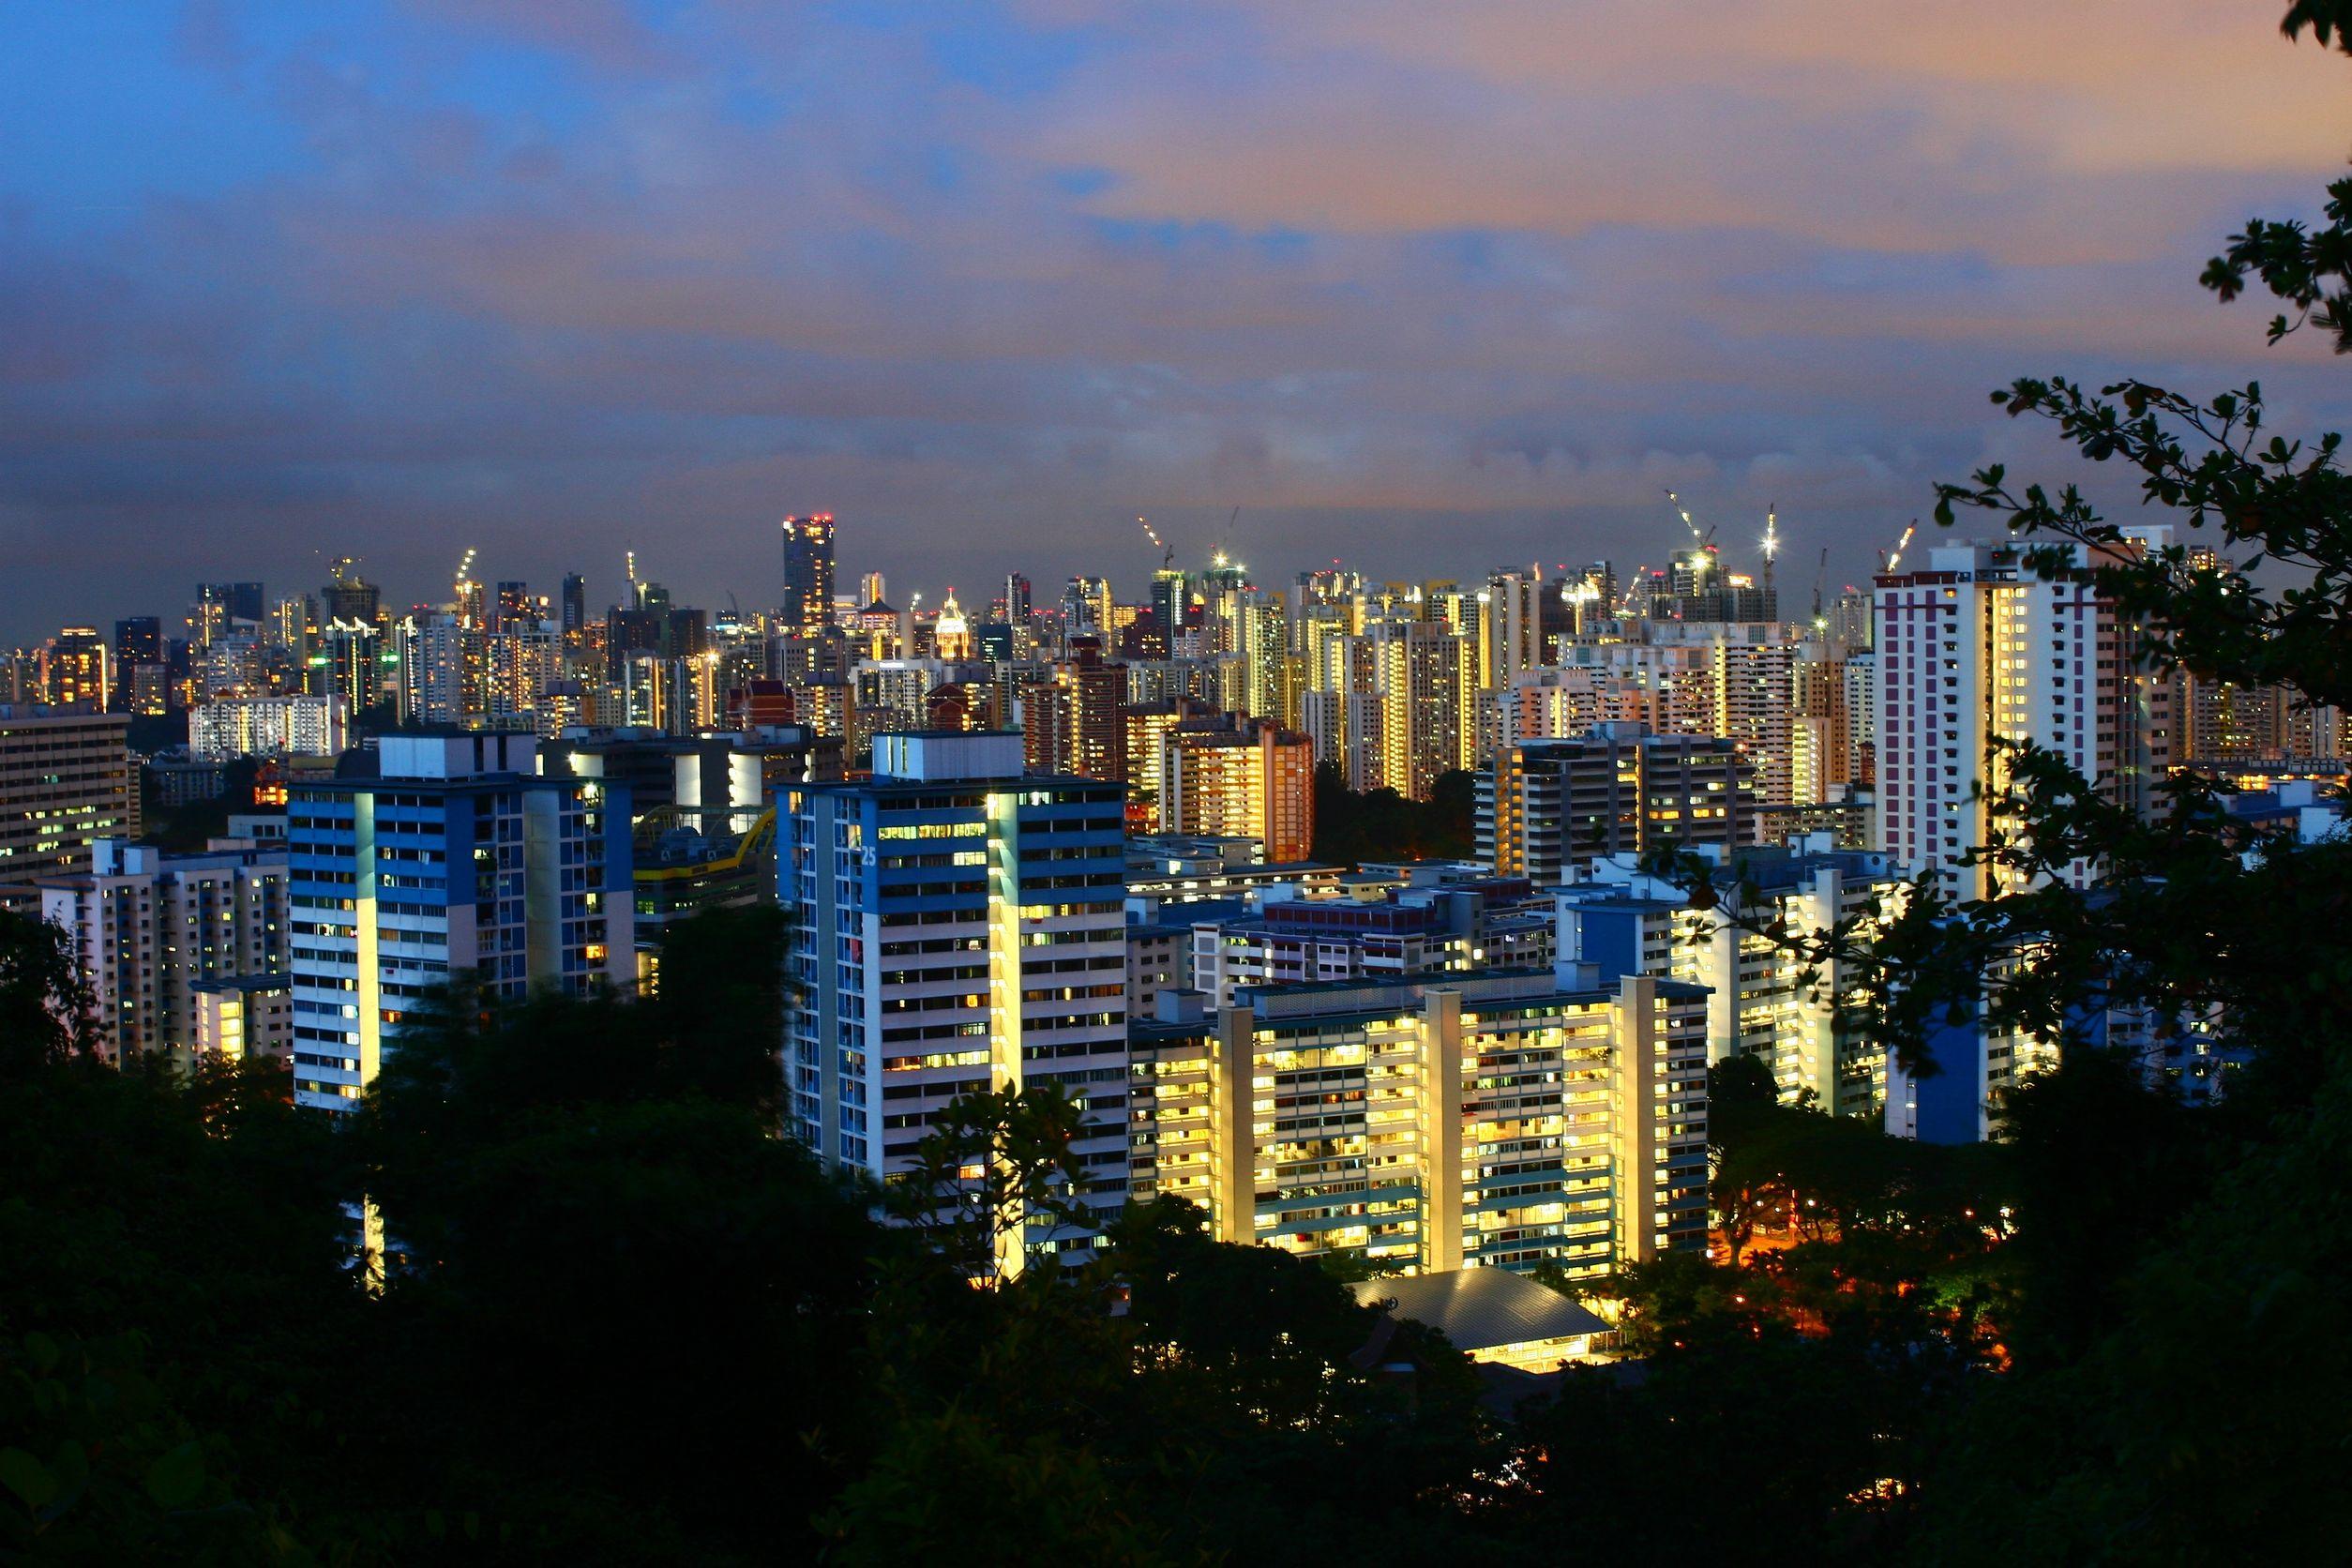 22574565 - singapore public housing, urban landscape hdb flat